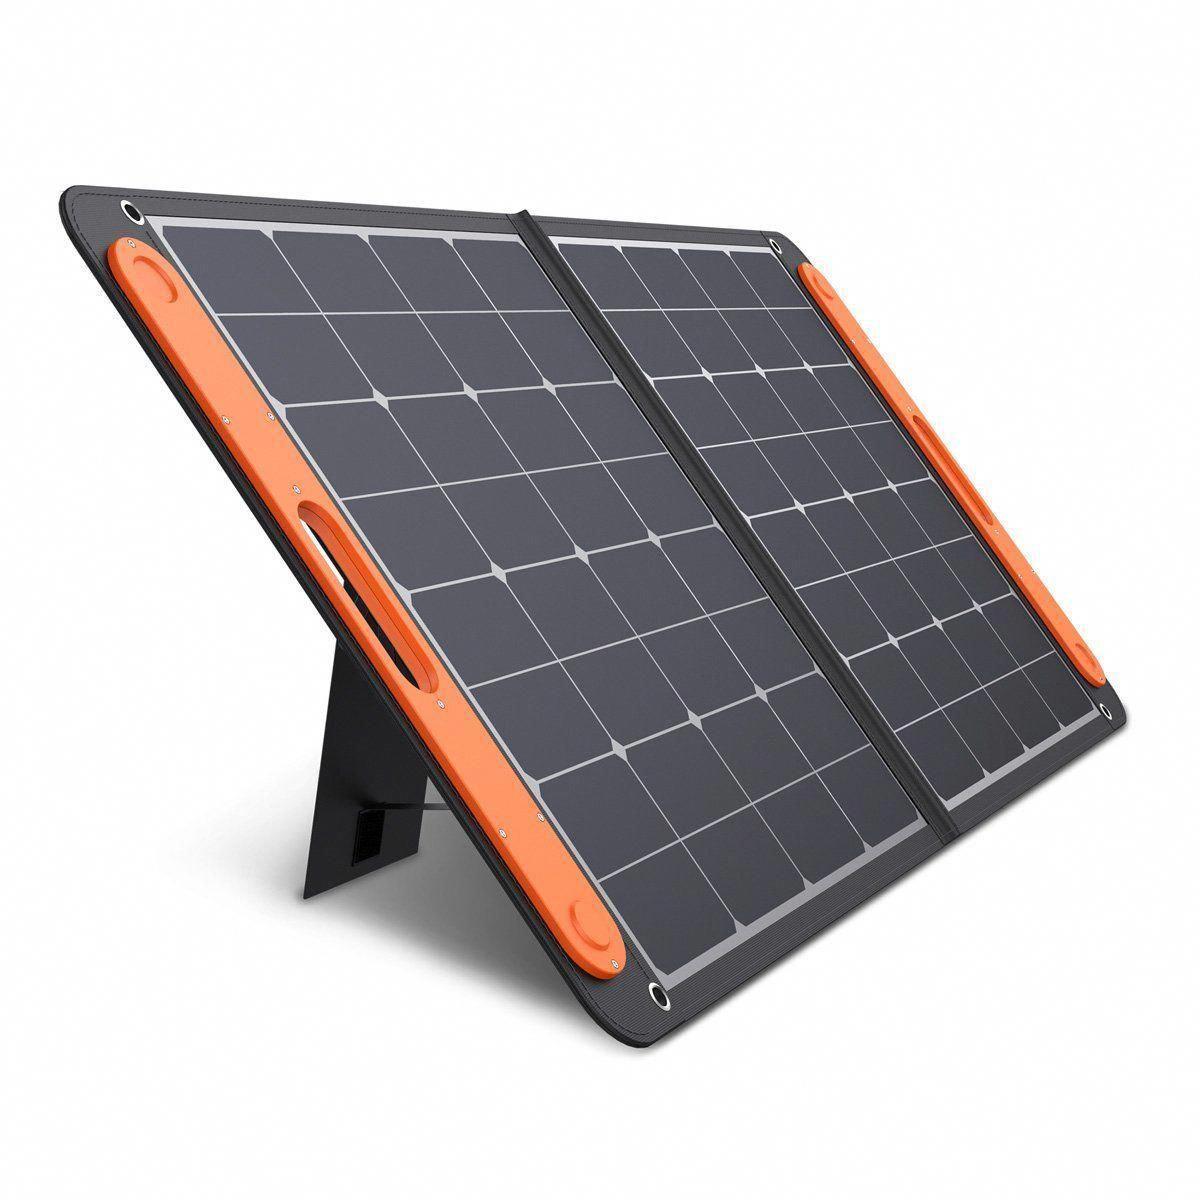 100w Solar Panel Foldable With Usb Dc Ports Jackery Solarpanels Solarenergy Solarpower Solargenerato In 2020 Solar Panels Portable Solar Panels Best Solar Panels